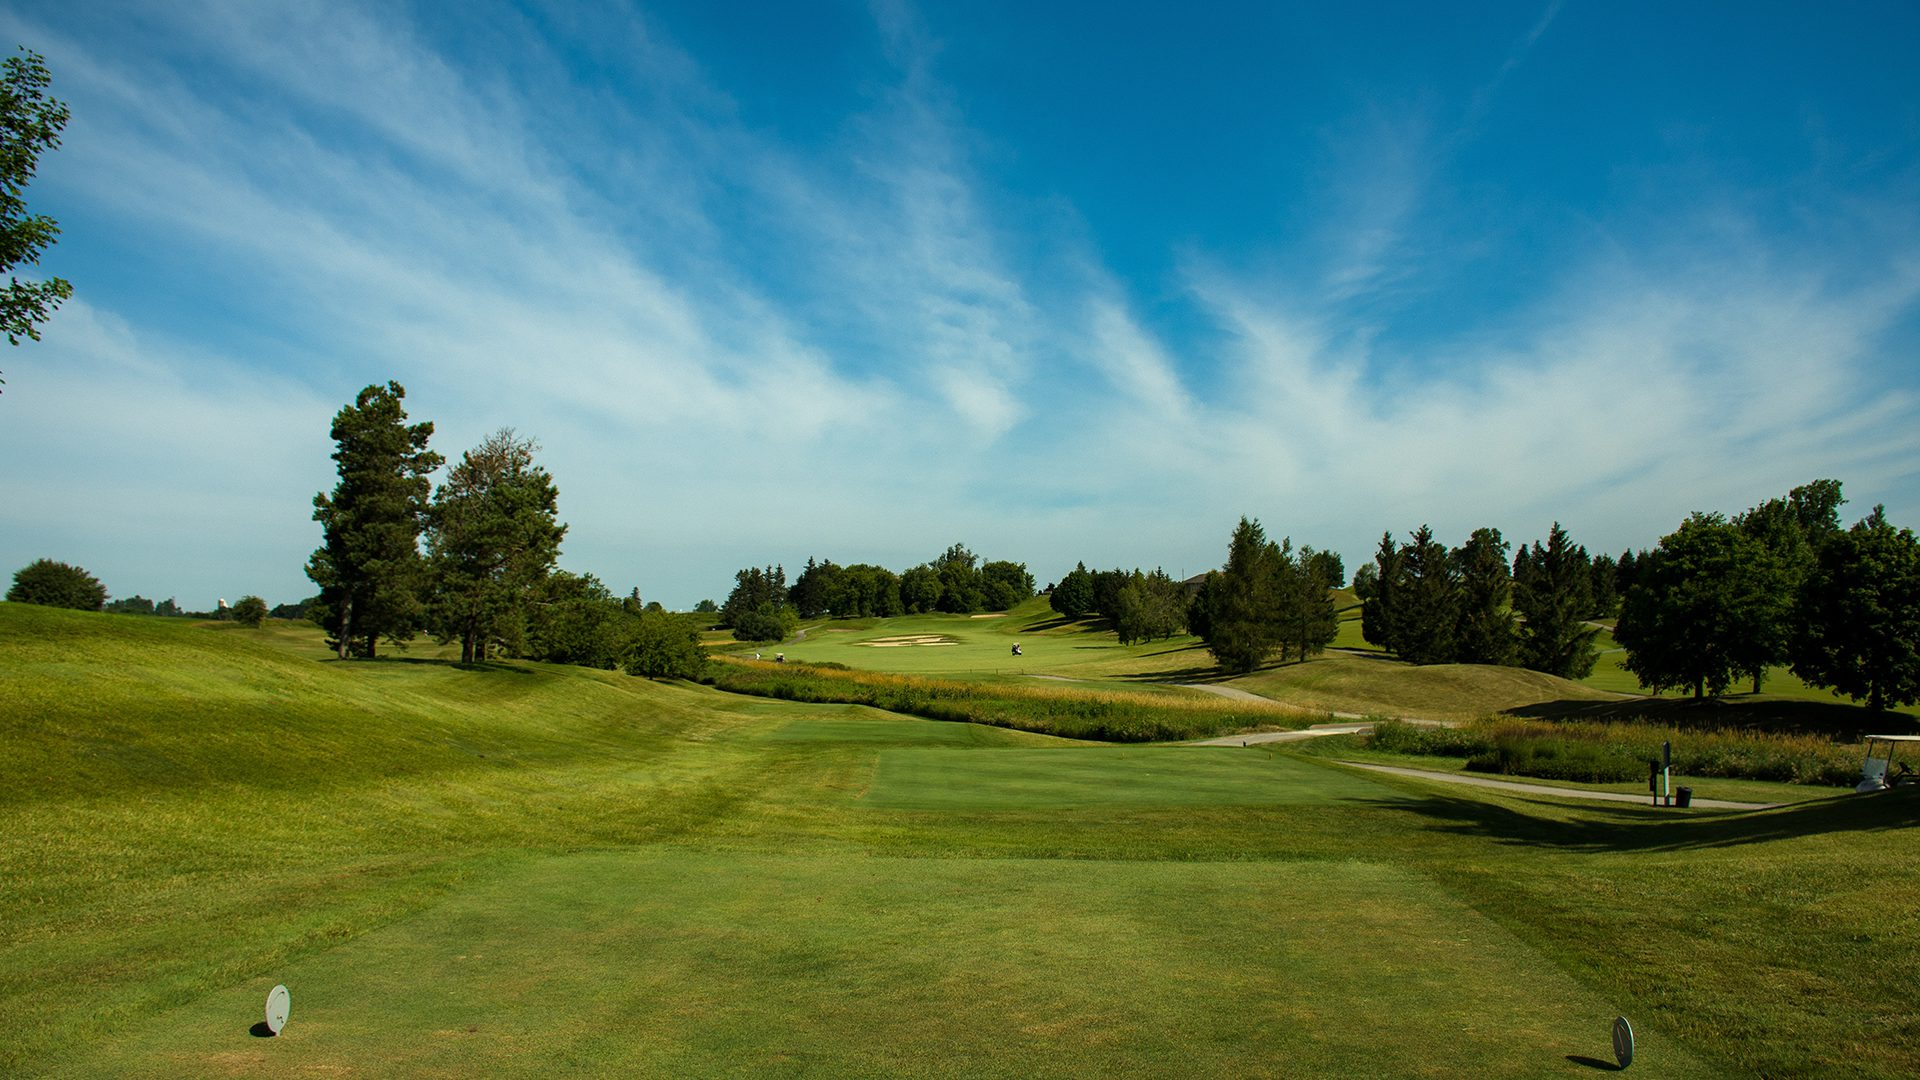 Eccleston Park Golf Club